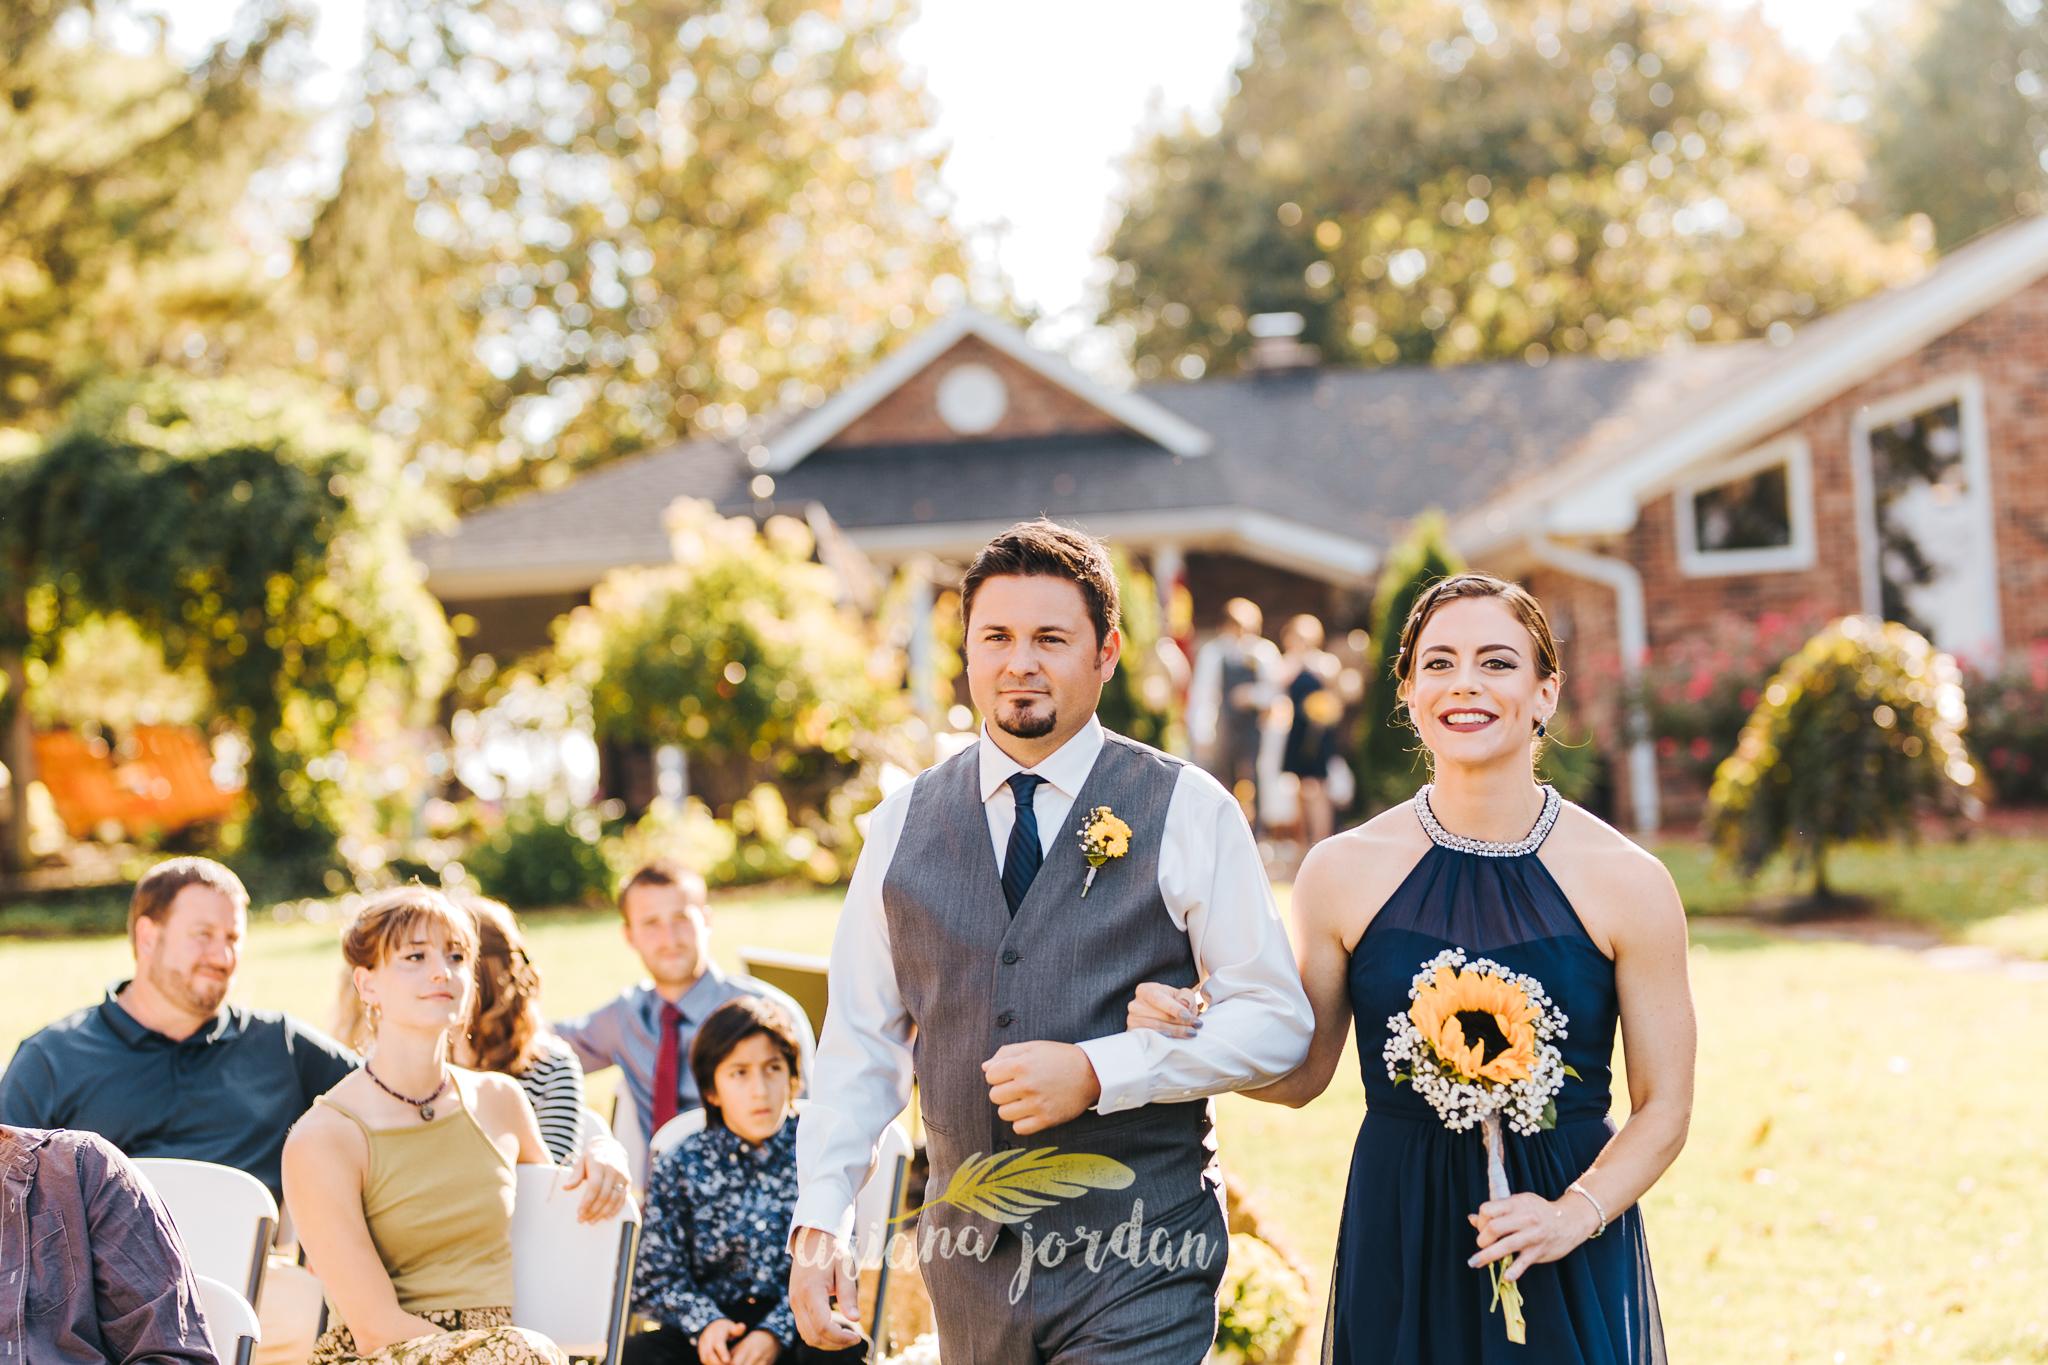 058 Ariana Jordan Photography -Moonlight Fields Lexington Ky Wedding Photographer 4486.jpg